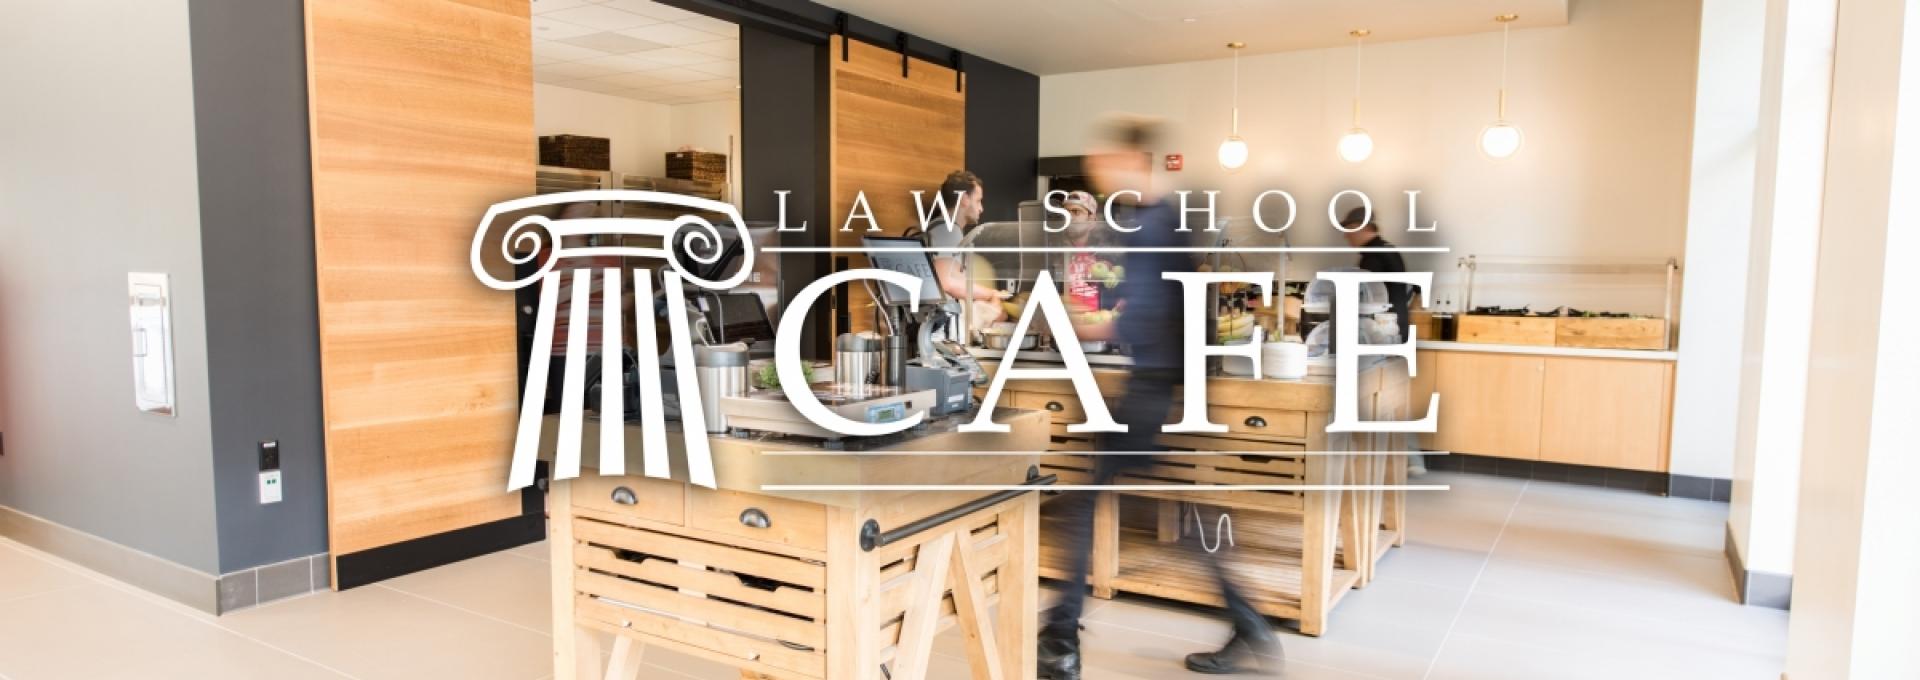 Law School Cafe